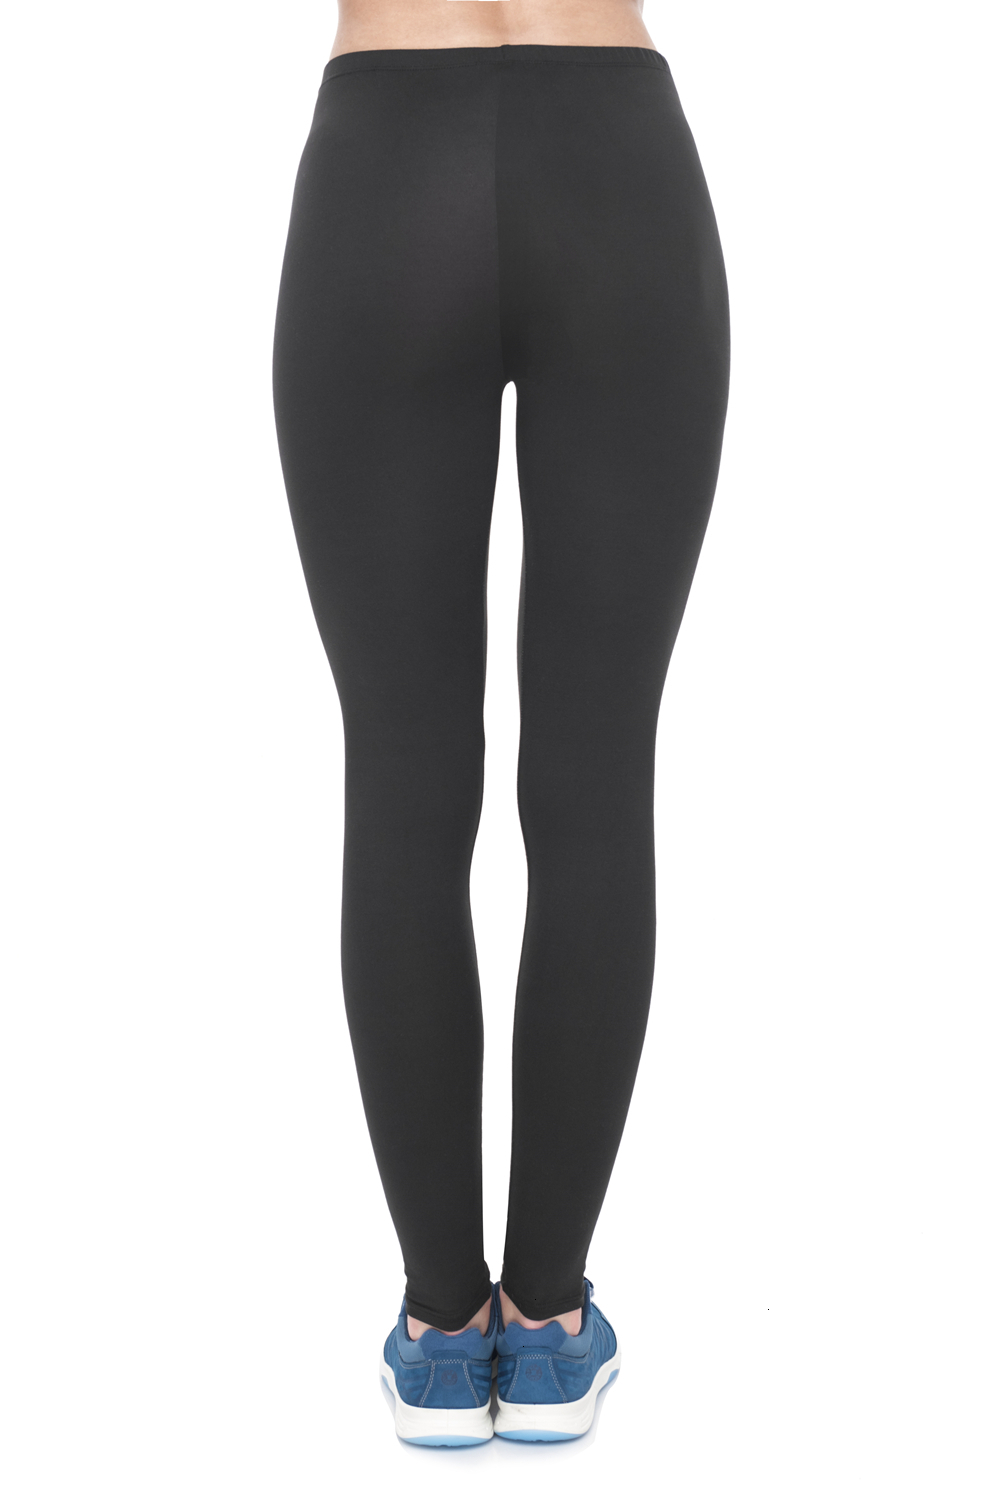 lgb00003 Basic leggings black fashion style (20)